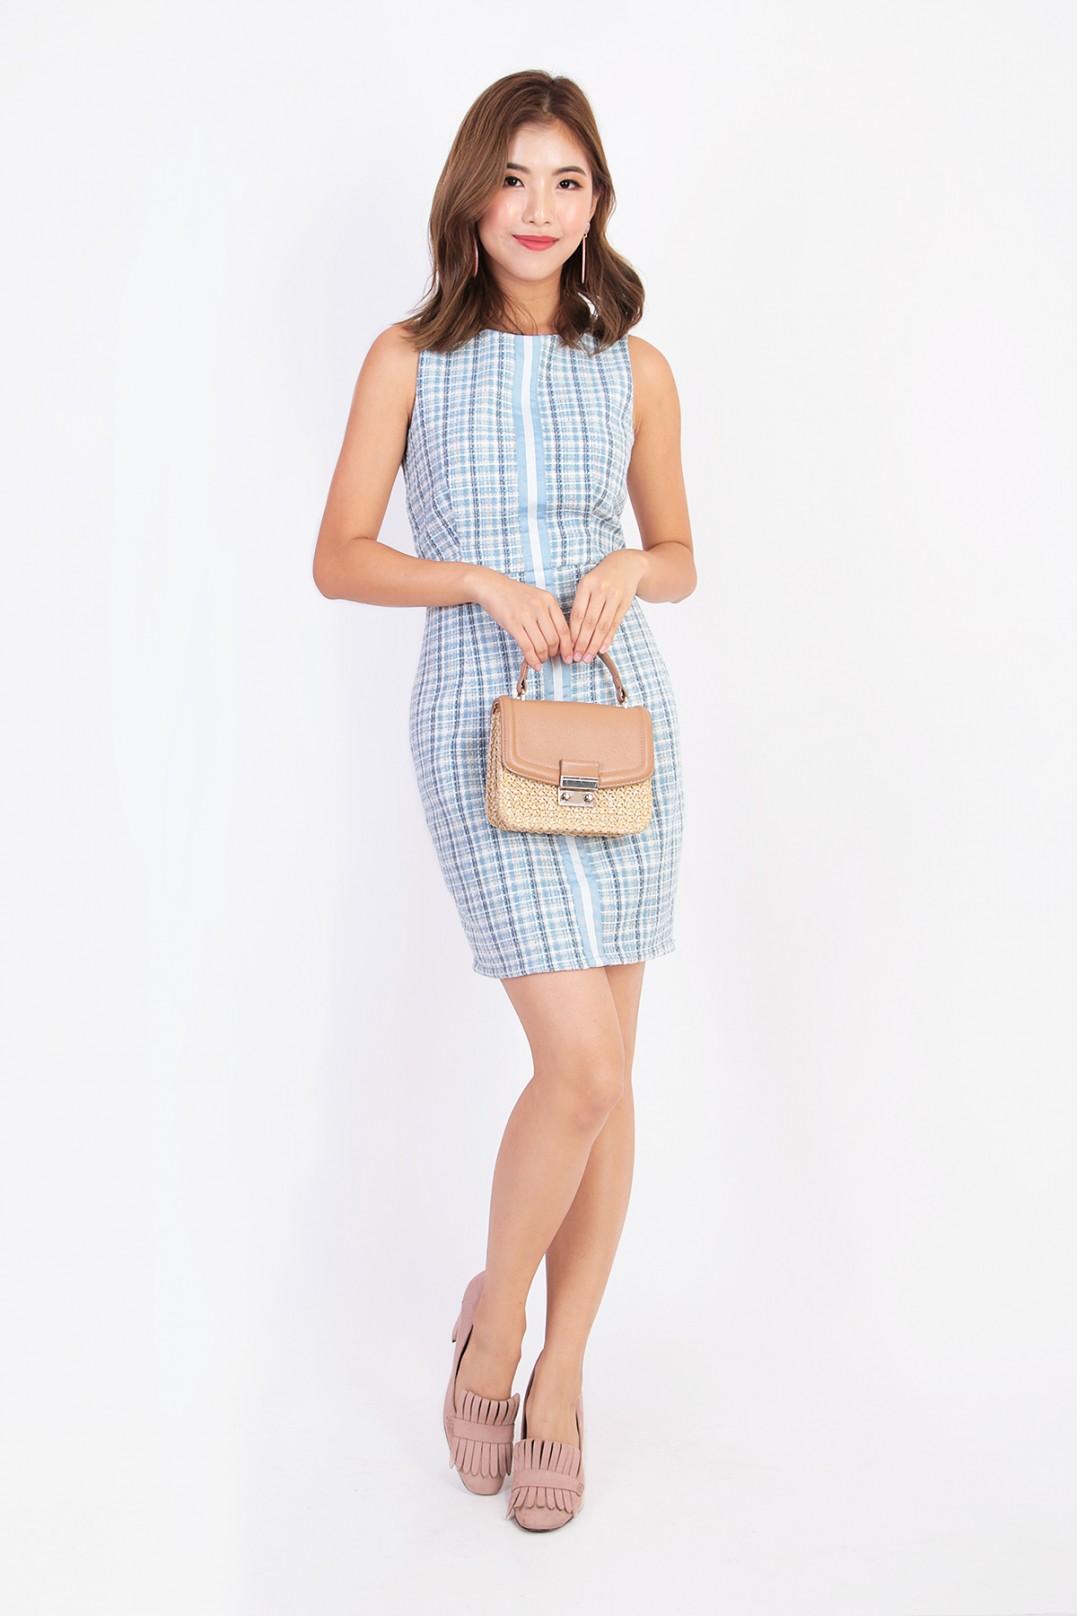 217288353b Maelys Tweed Dress - MGP